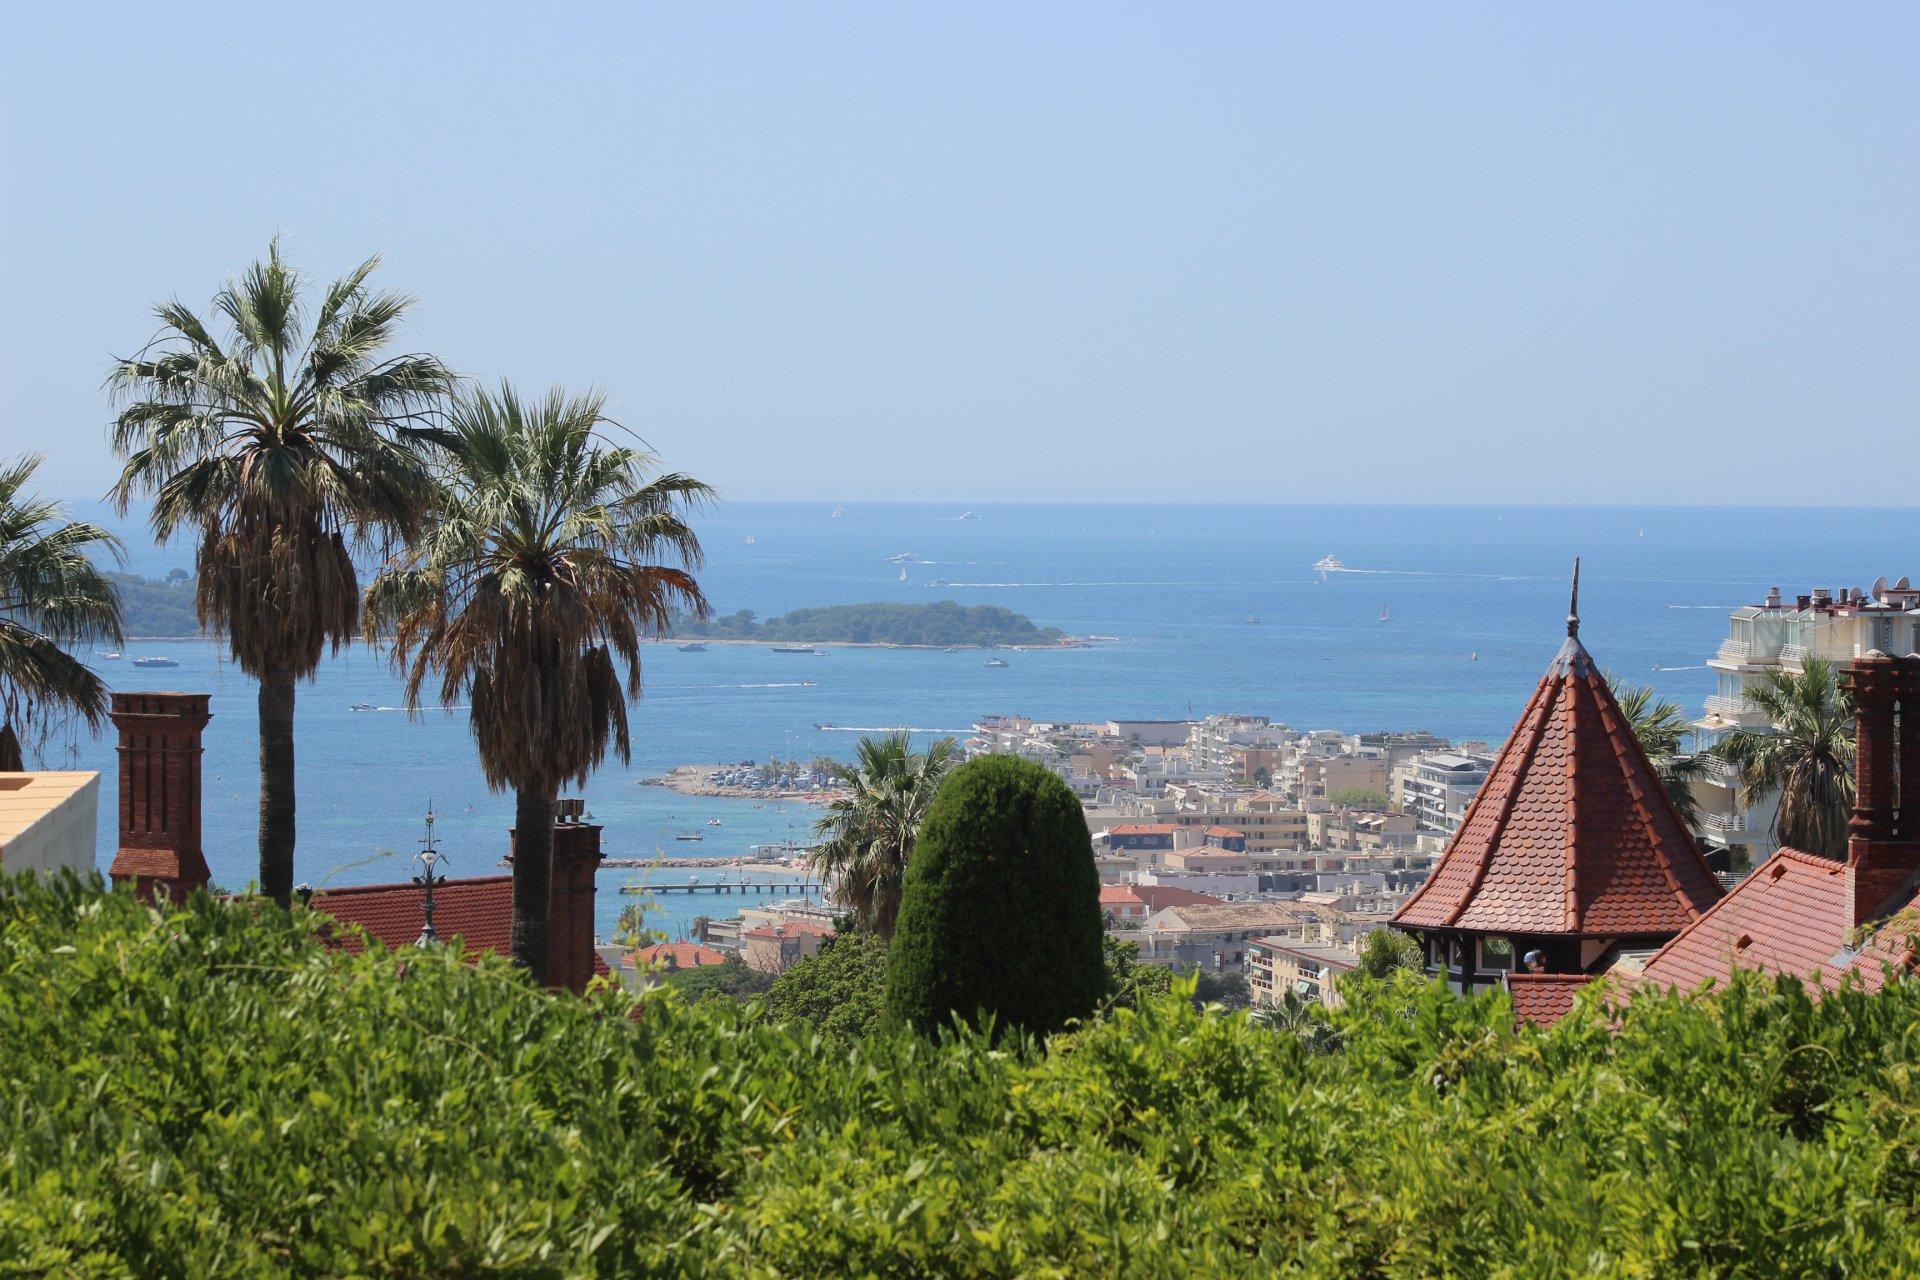 Havsutsikt och swimmingpool Cannes Californie